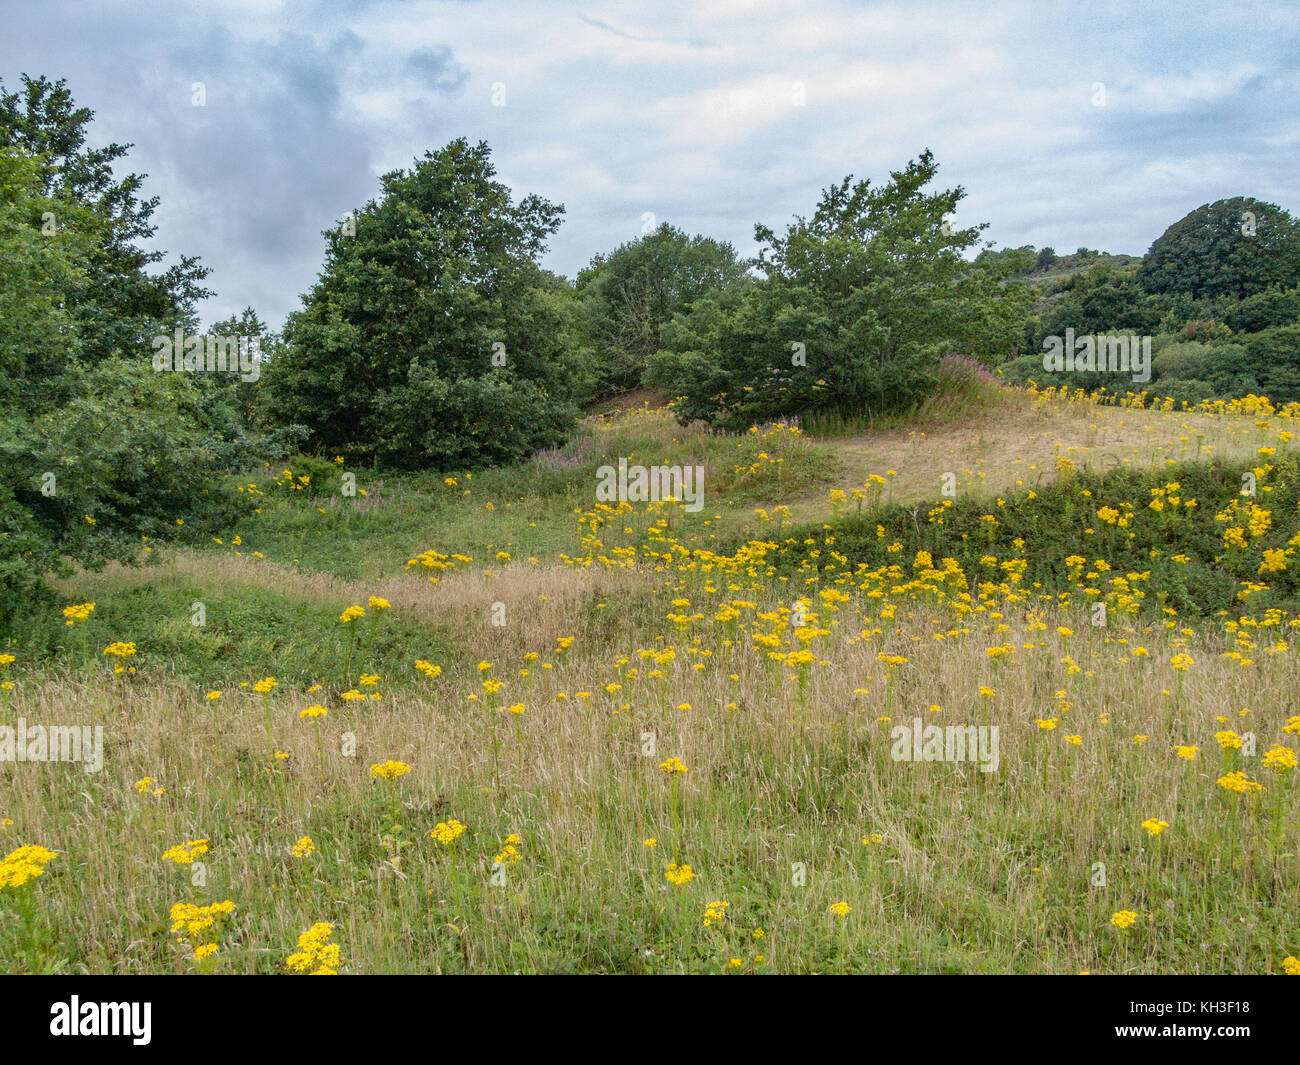 Coastal sand dune ecosystem with yellow flowers of Common Ragwort (Senecio jacobaea) in evidence. - Stock Image